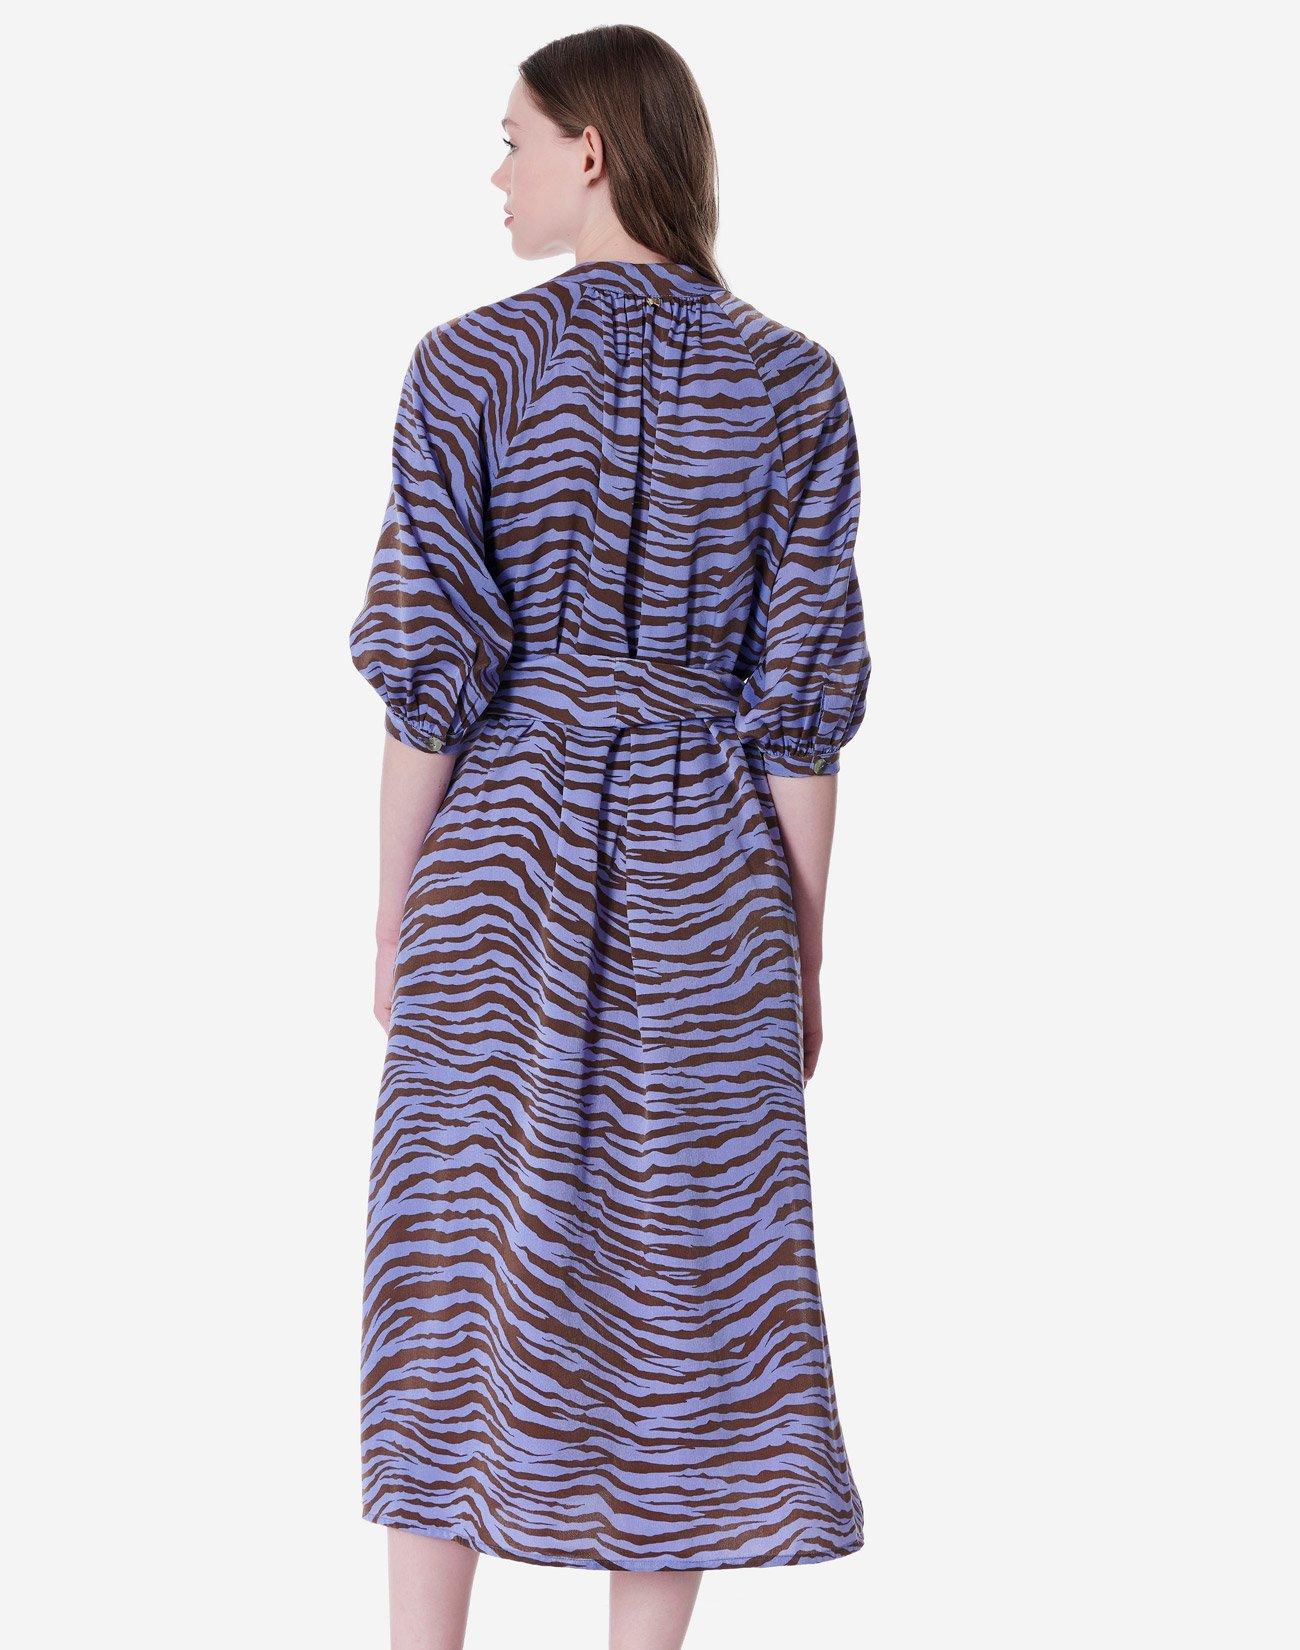 Animal print shirt dress